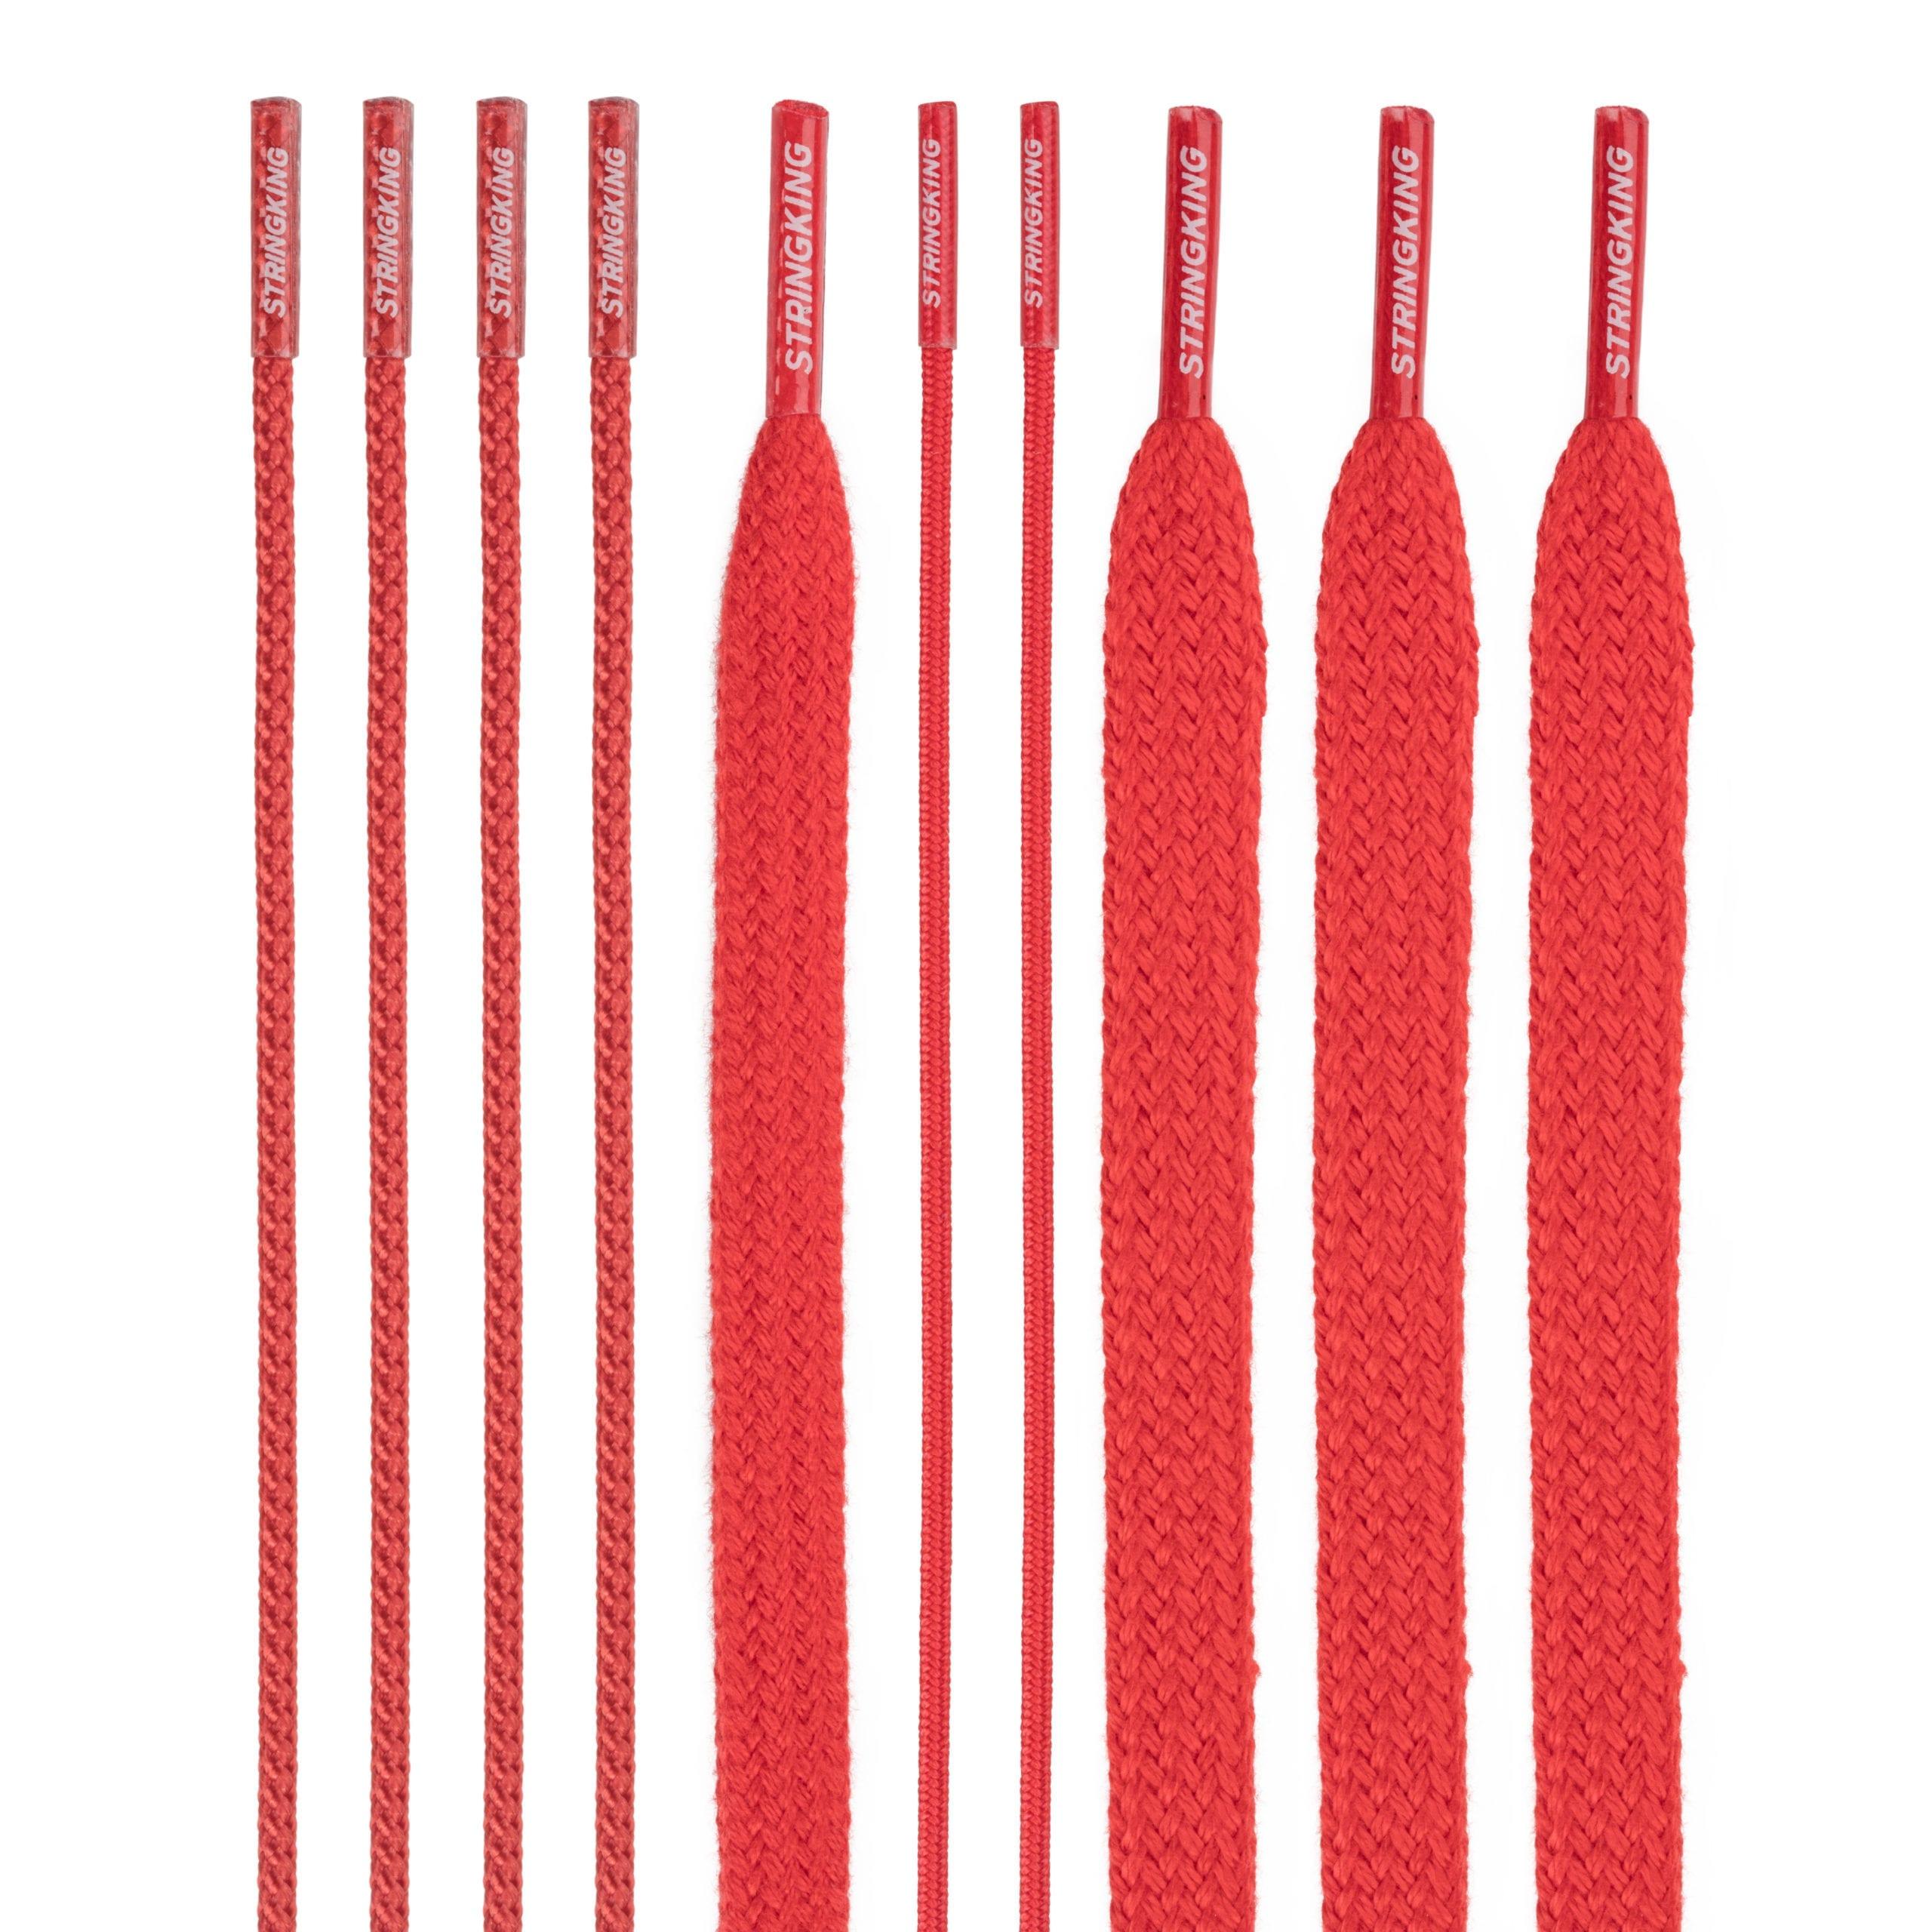 string-kit-BB-retailers-red-scaled-1.jpg